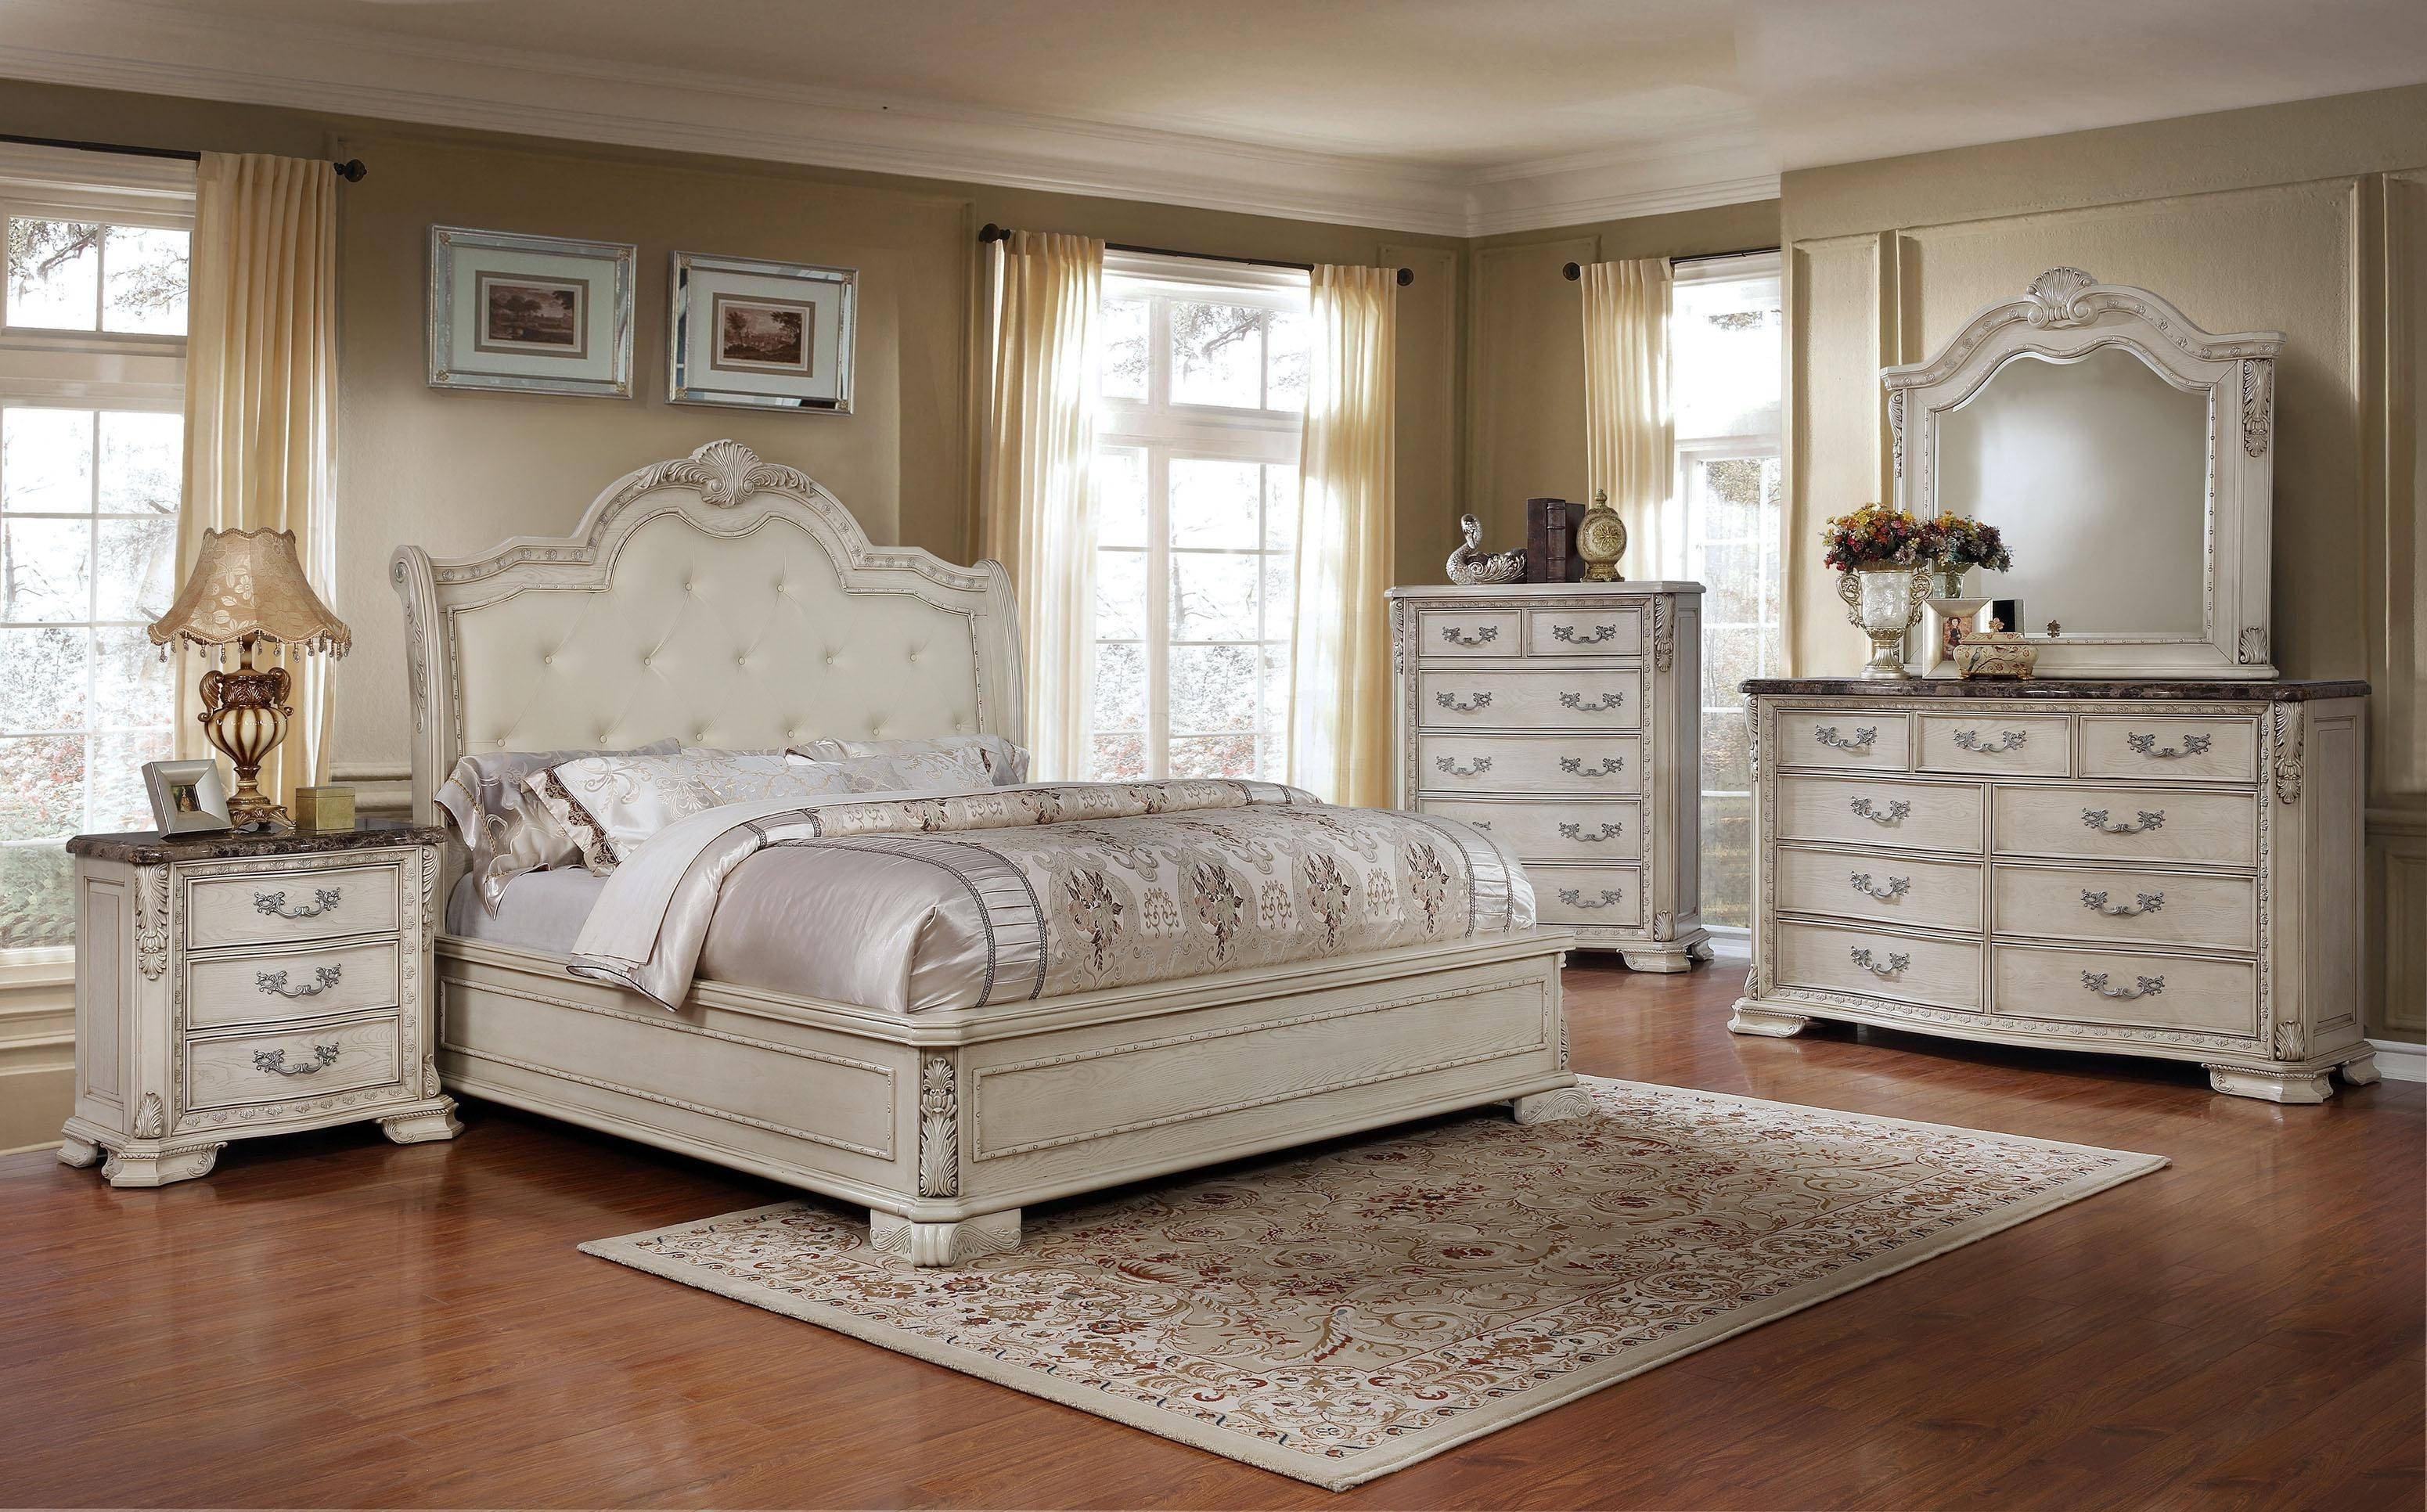 Tufted King Bedroom Set Luxury Mcferran B1000 Antique White Tufted King Size Bedroom Set